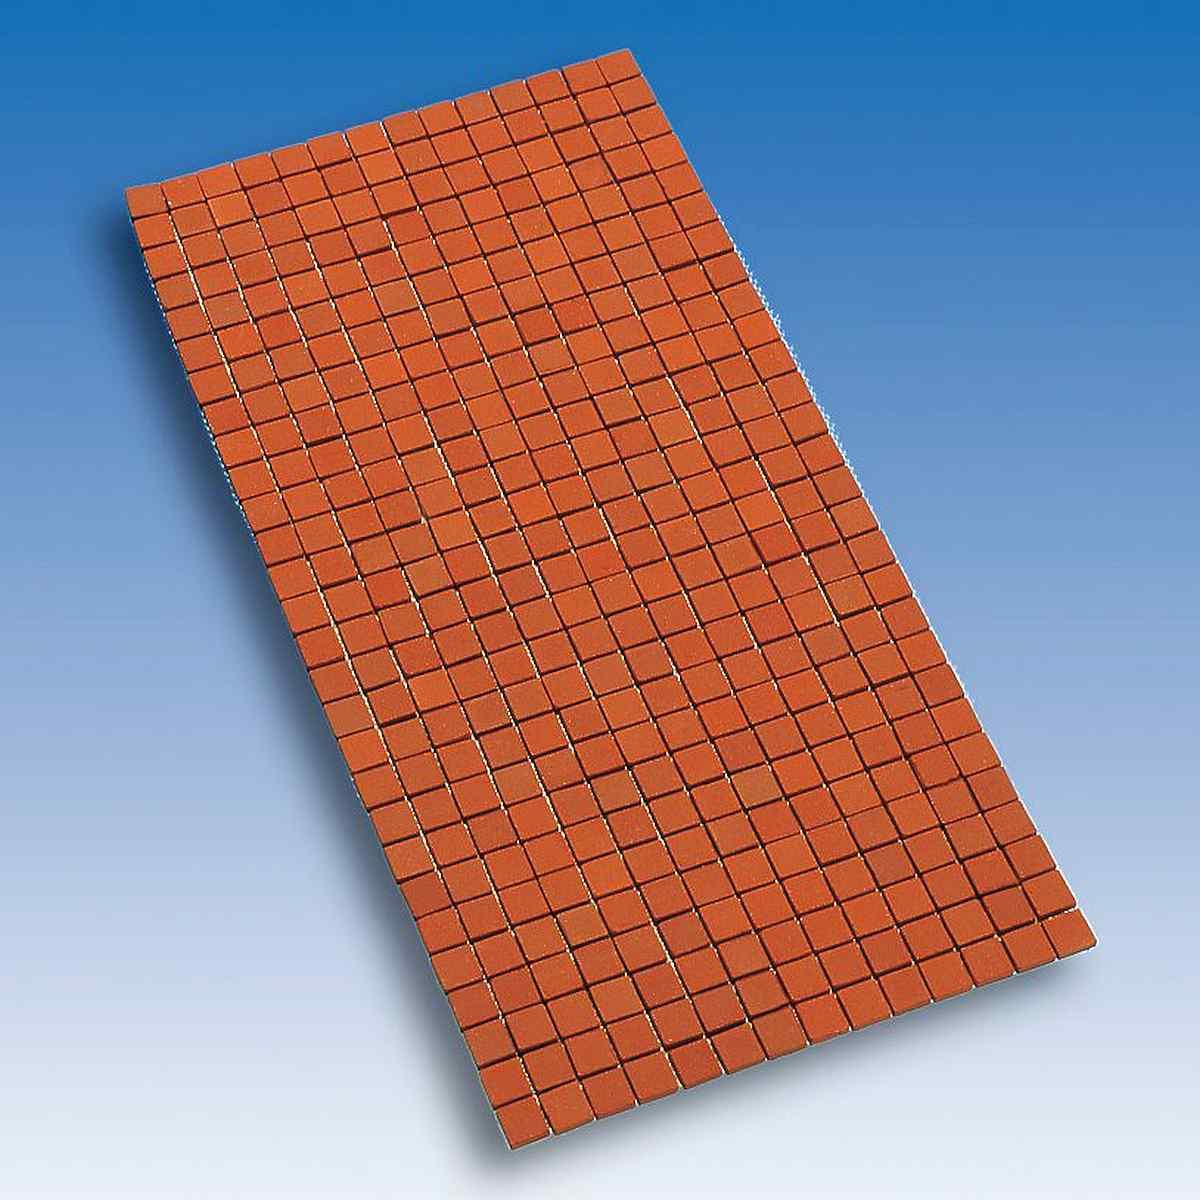 Big tiles in a small bathroom - Meshed Terracotta Floor Tiles 82020